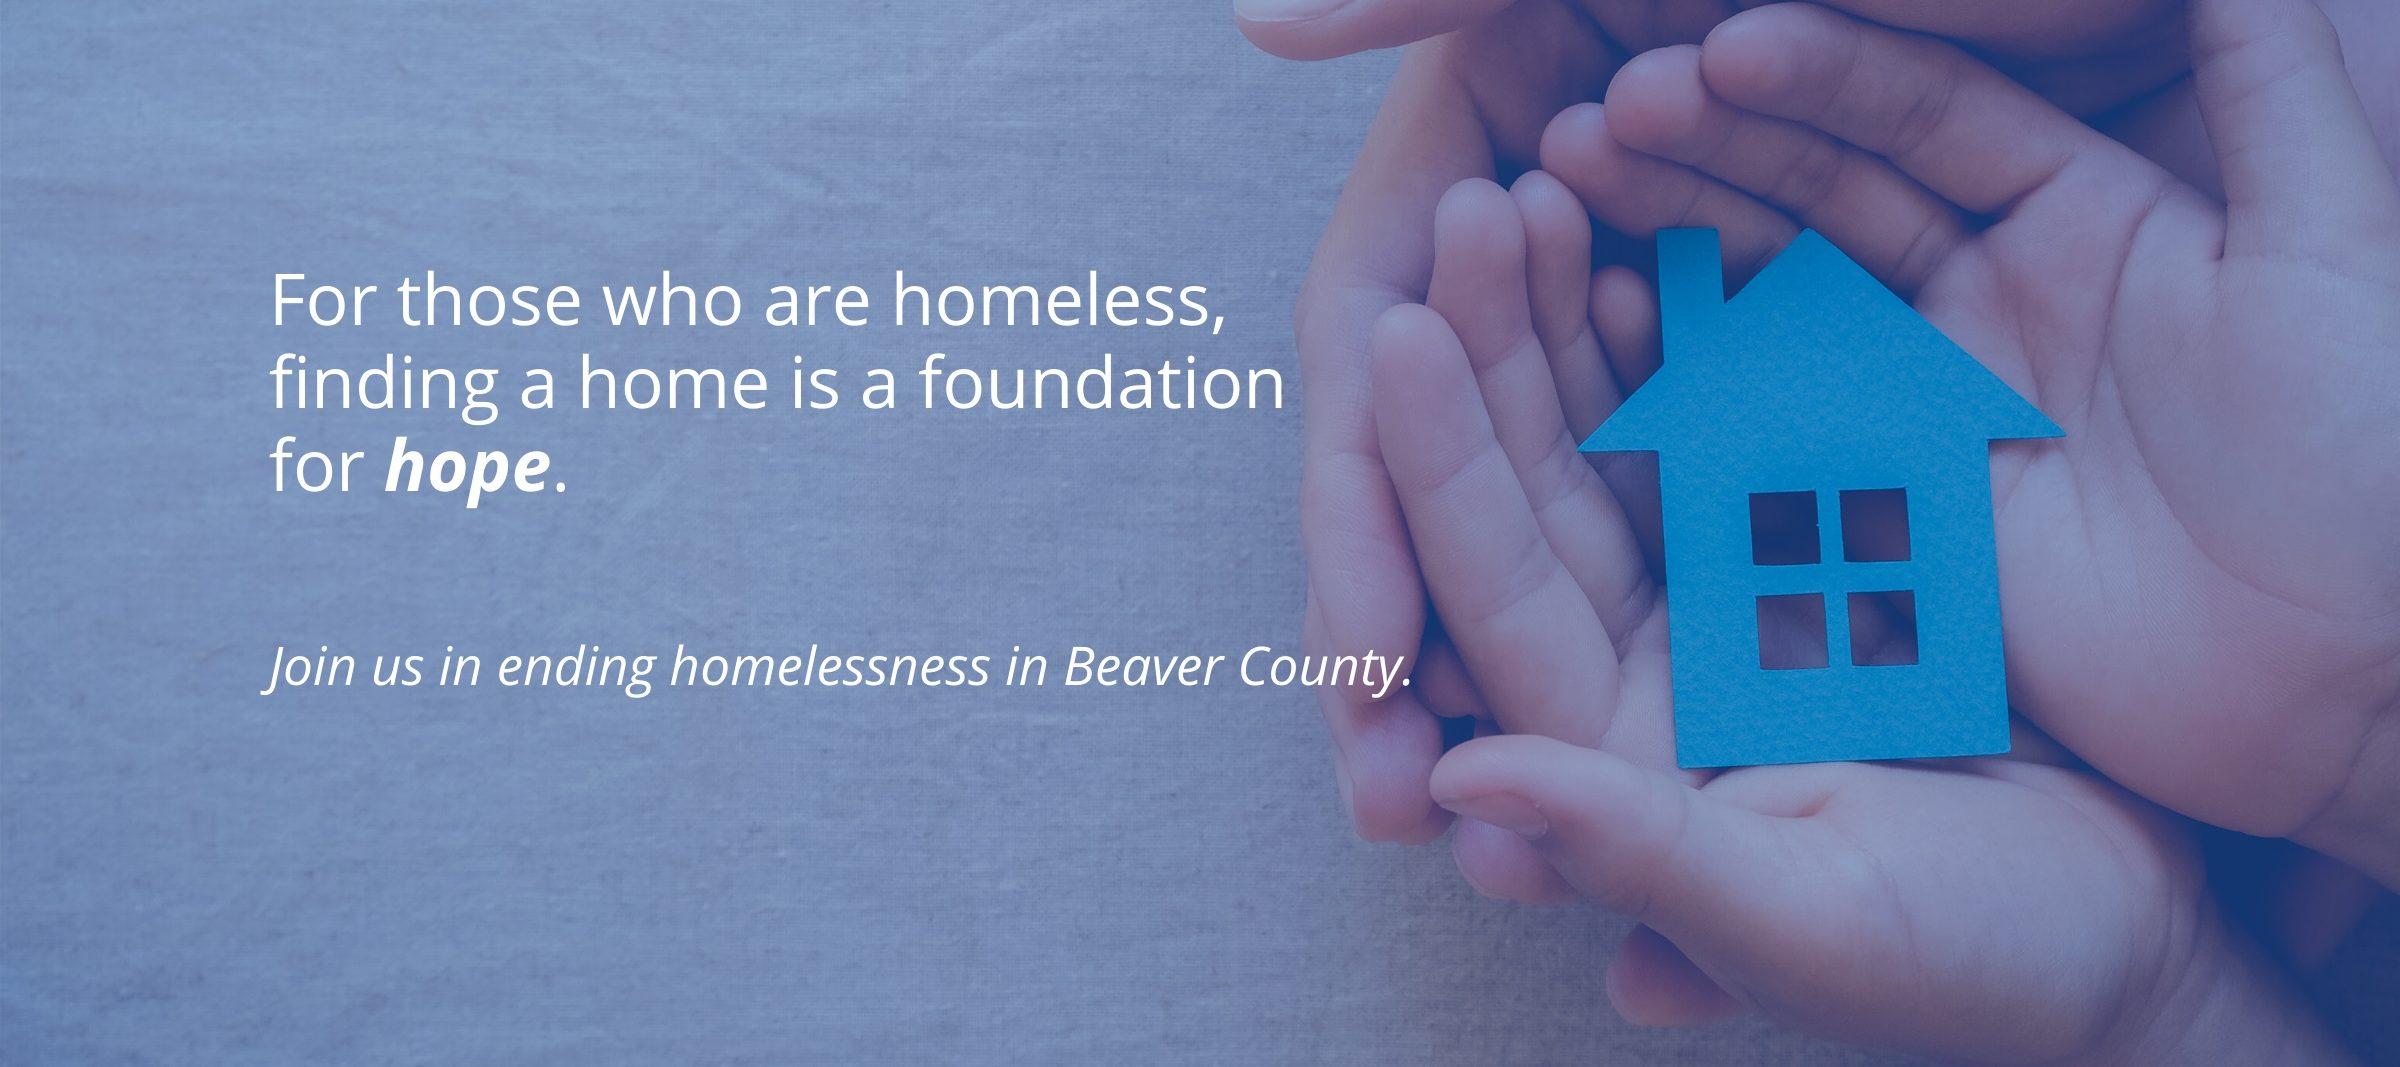 The Cornerstone of Beaver County